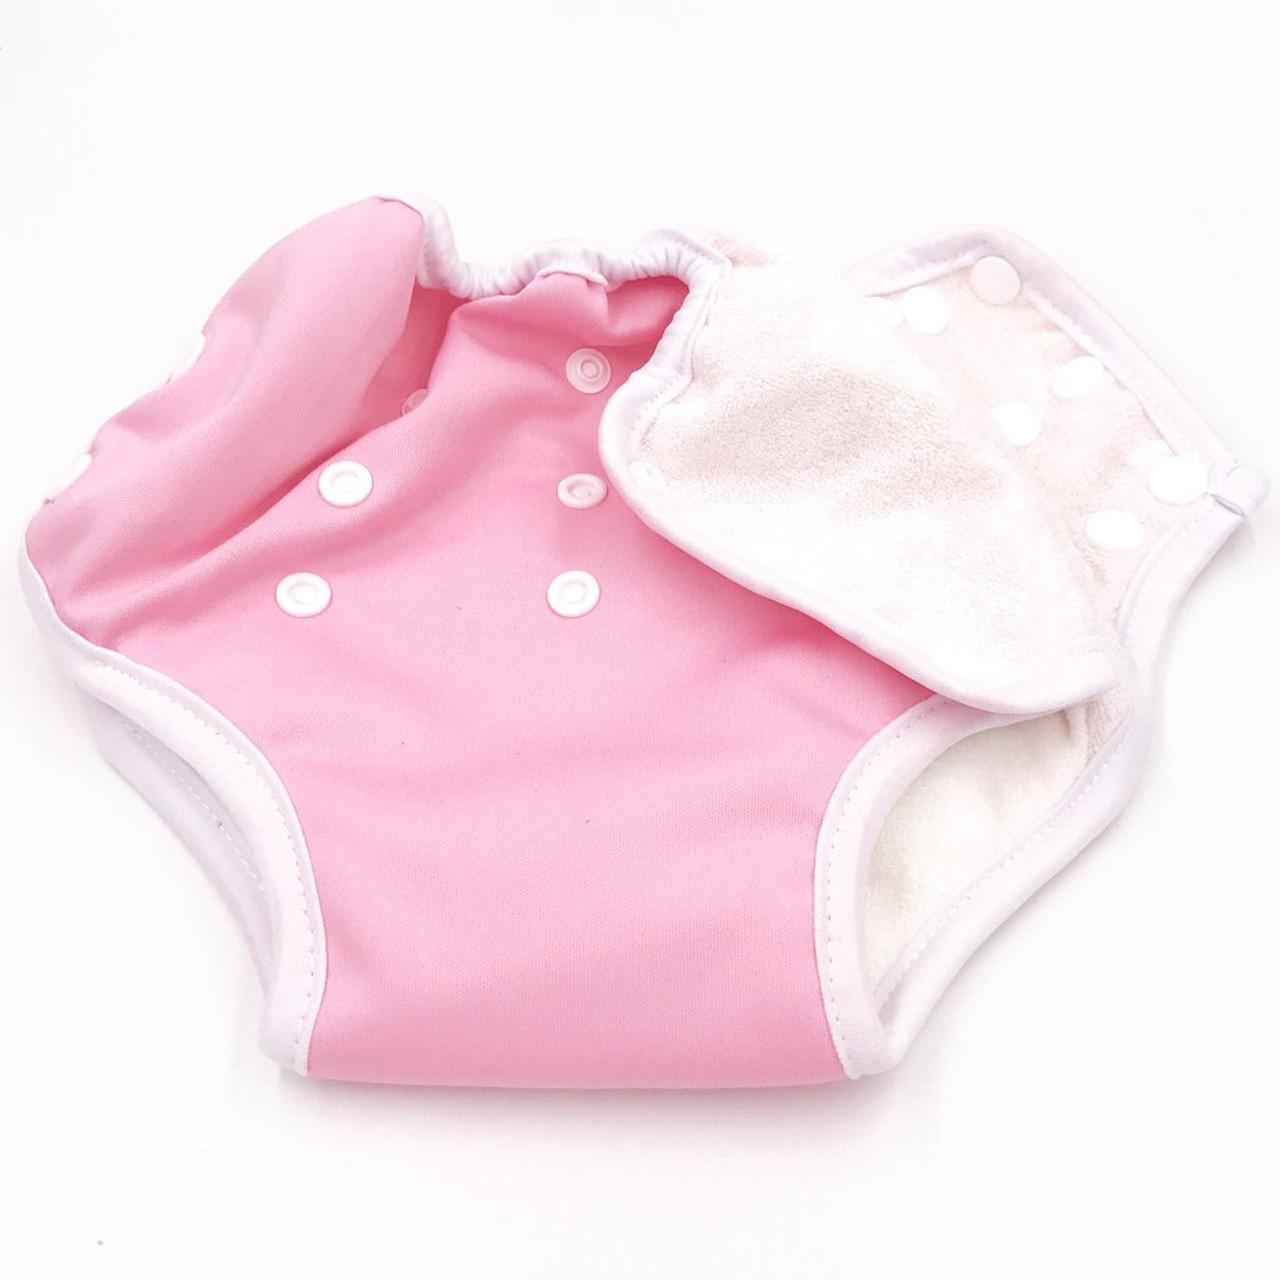 My Little Gumnut Training Pants at Baby Barn Discounts My Little Gumnut Australian theme stylish comfortable training pants.